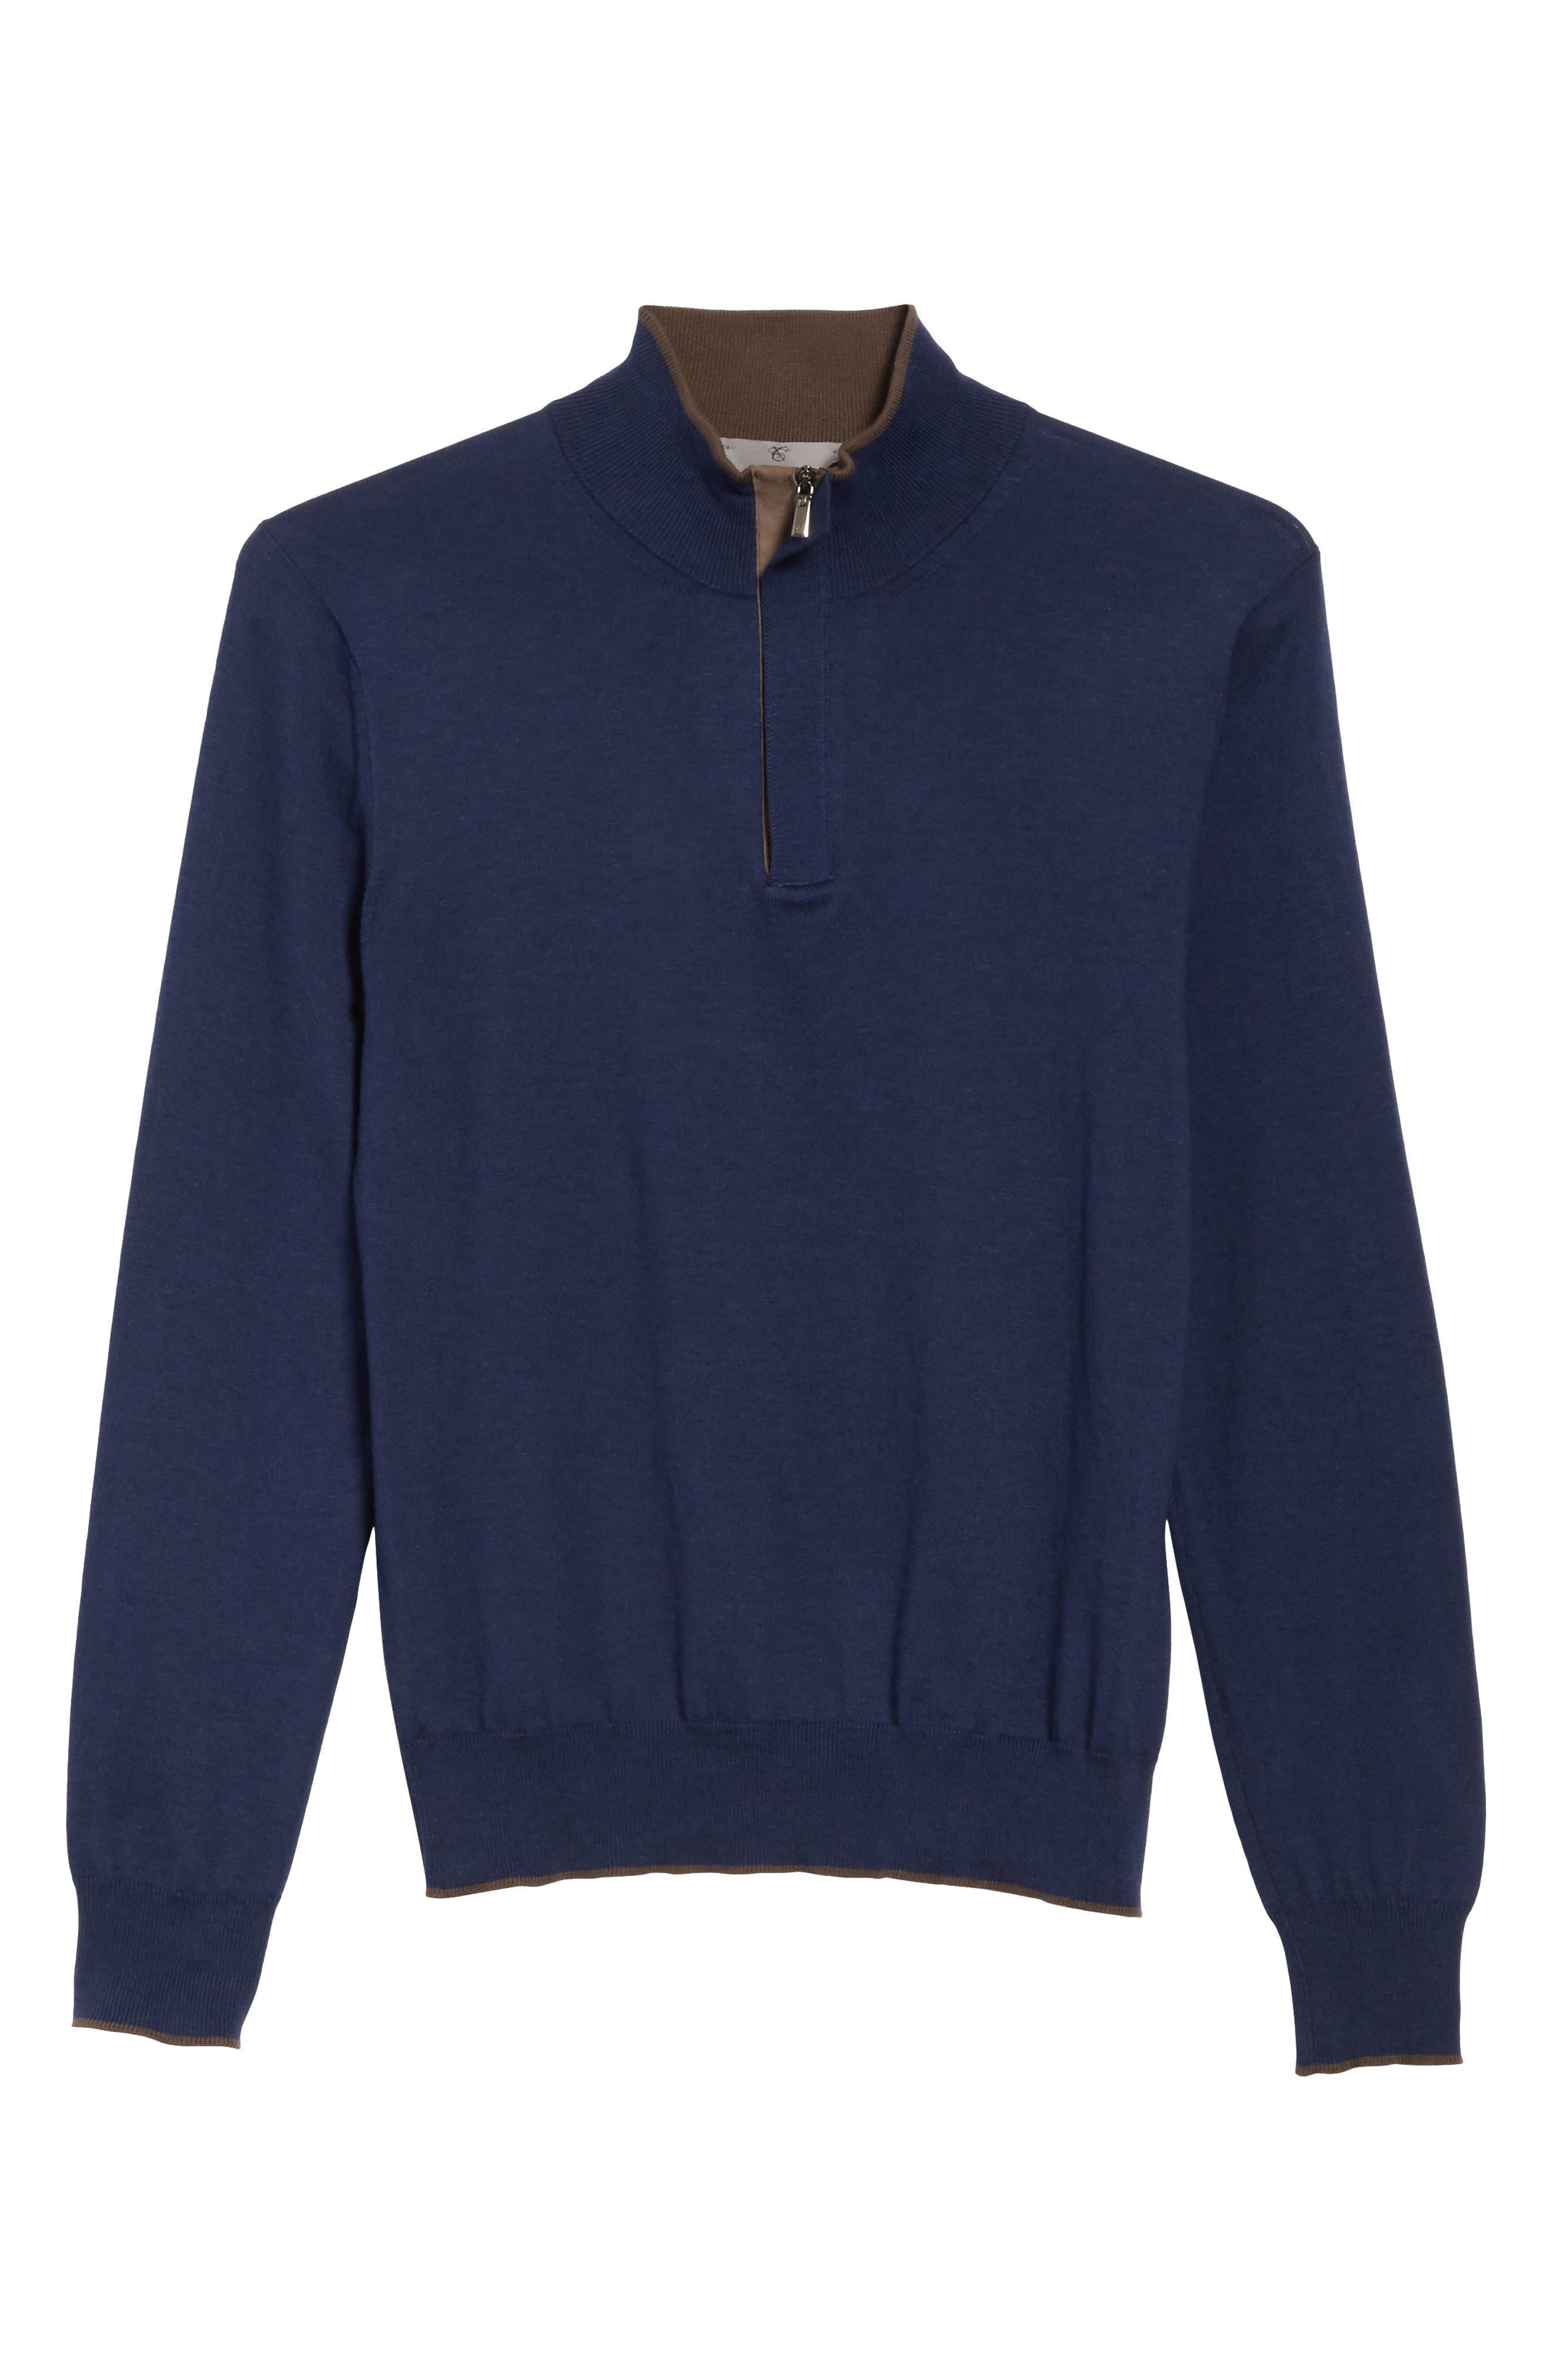 Quarter Zip Sweater,                             Alternate thumbnail 6, color,                             Dark Blue